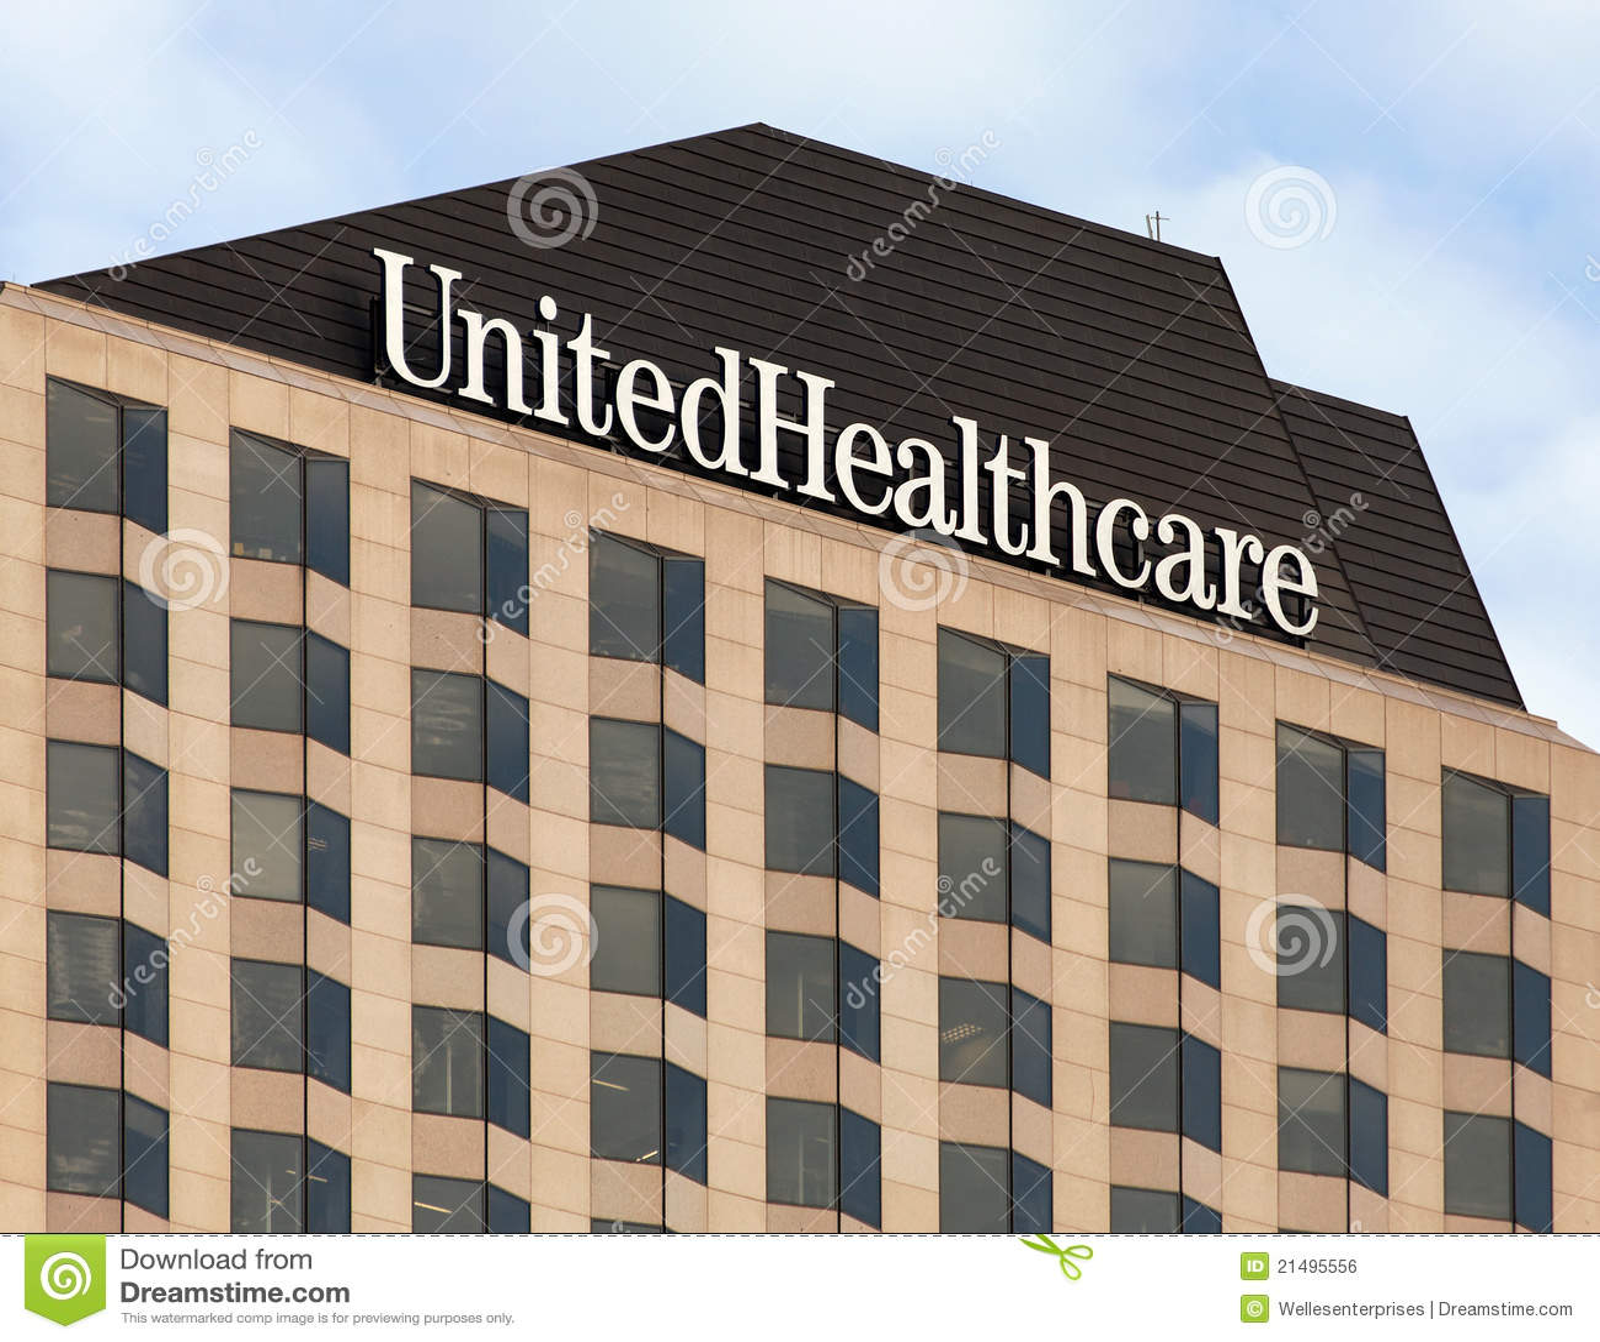 United Healthcare Building